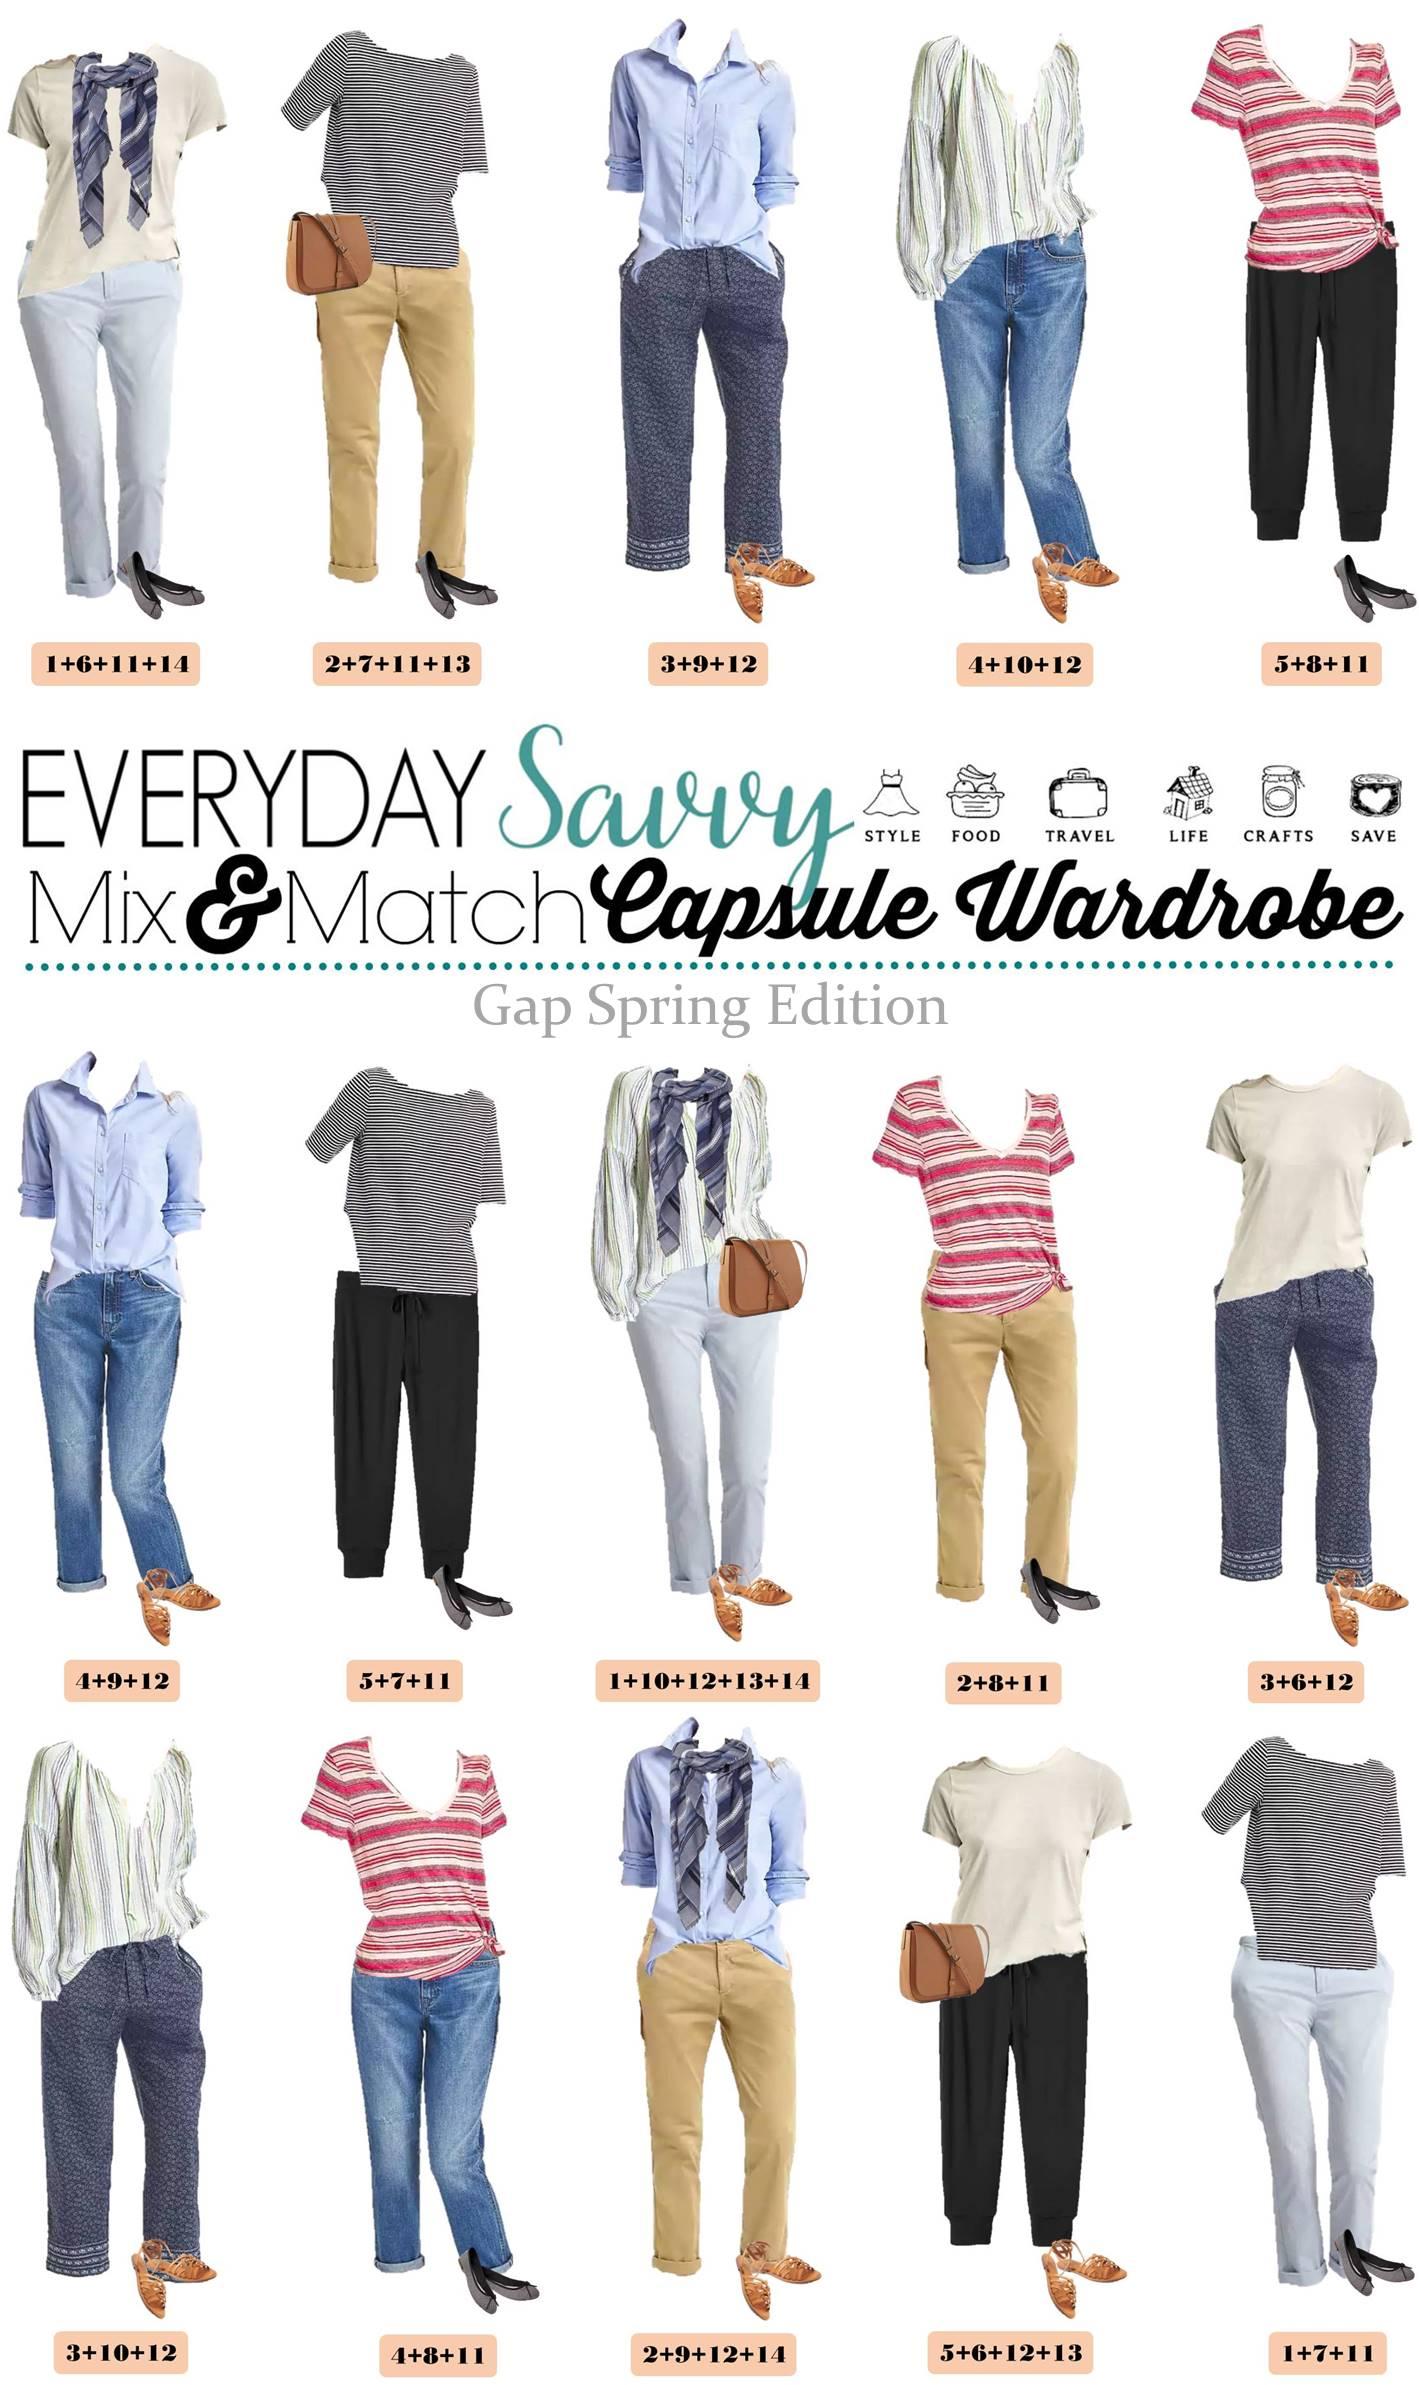 Gap Spring Capsule Wardrobe Great For Everyday Amp Travel